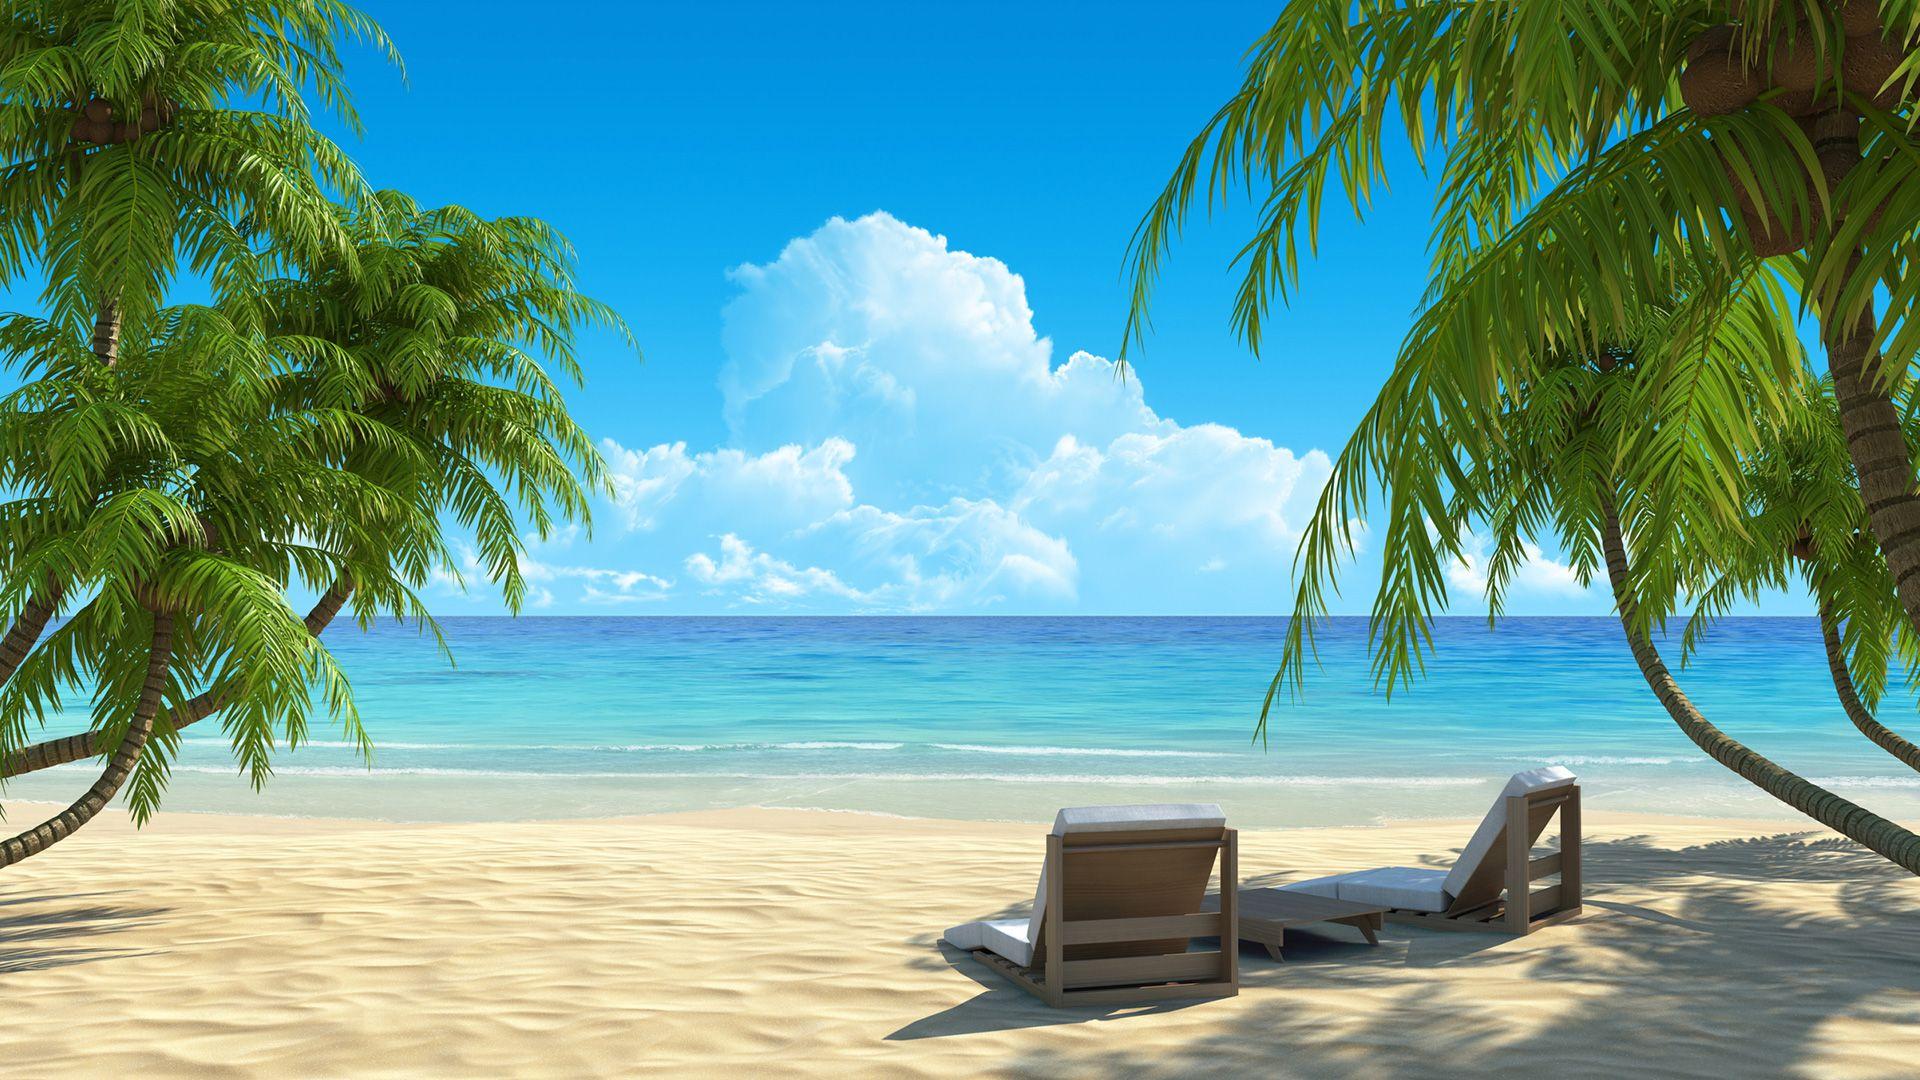 paradise paradise dream beach